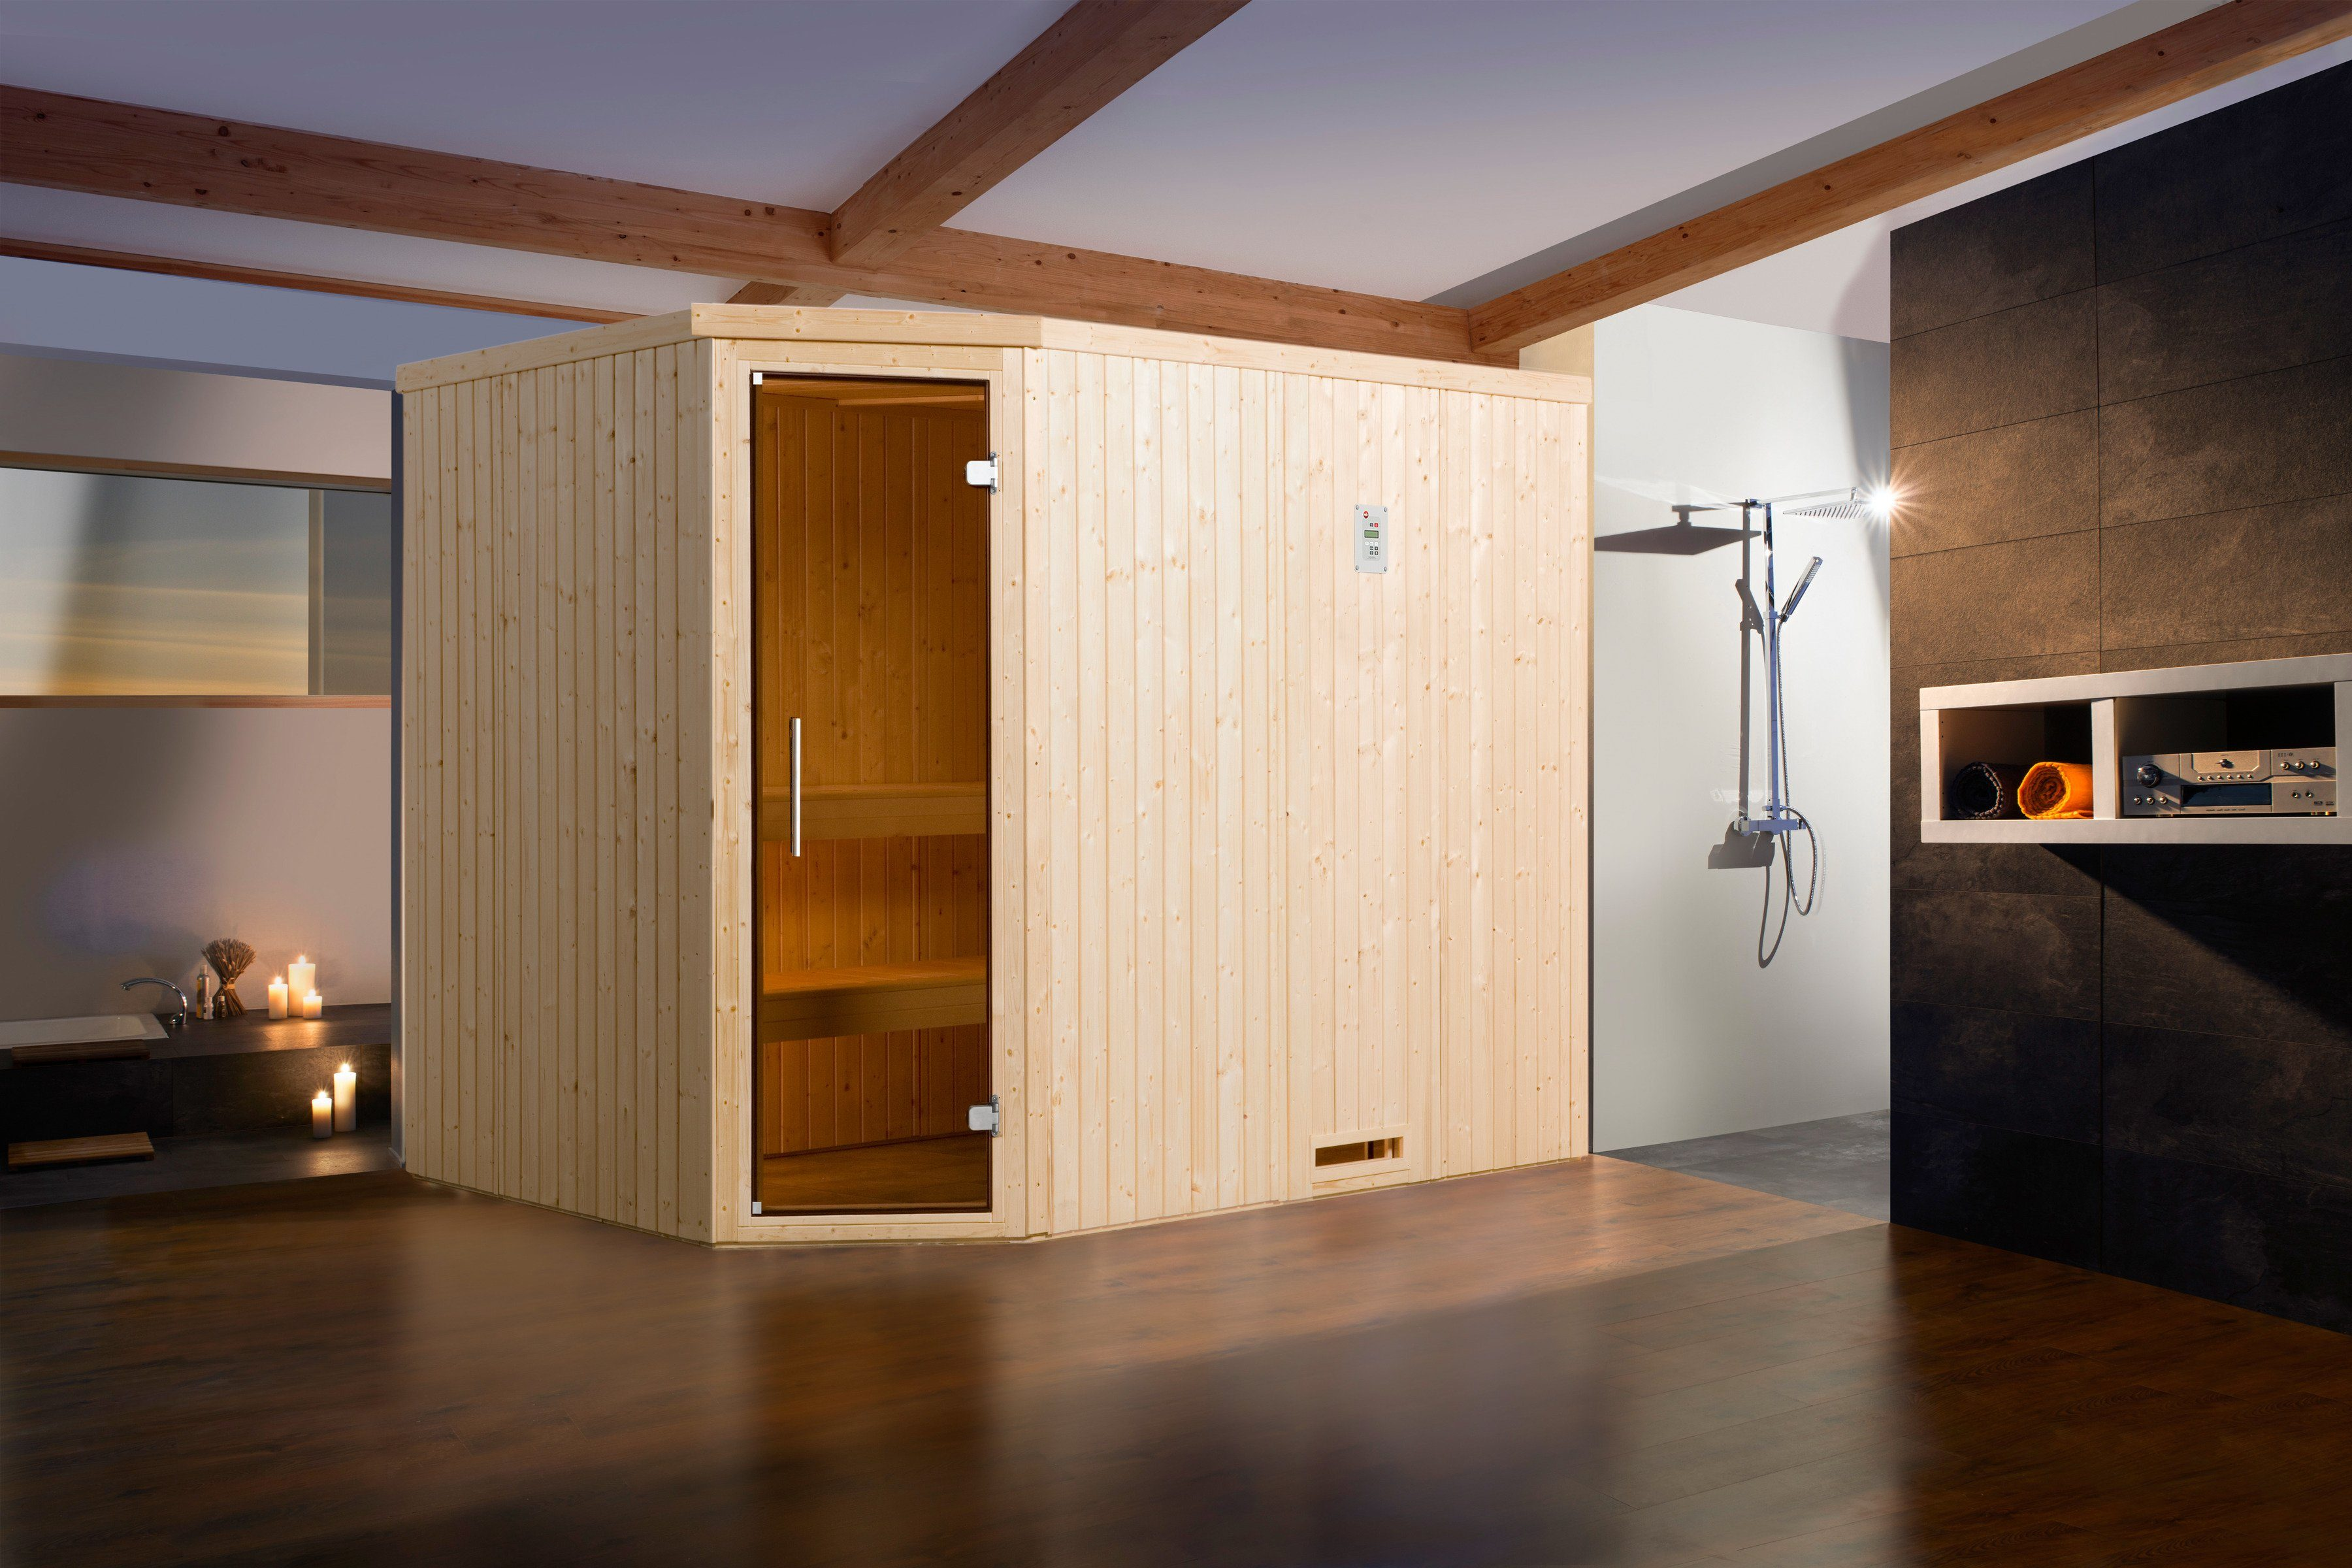 Weka Sauna »Lyngdal 4 Trend Kompakt«, 242/192/199 cm, 68 mm, 8-KW-Ofen